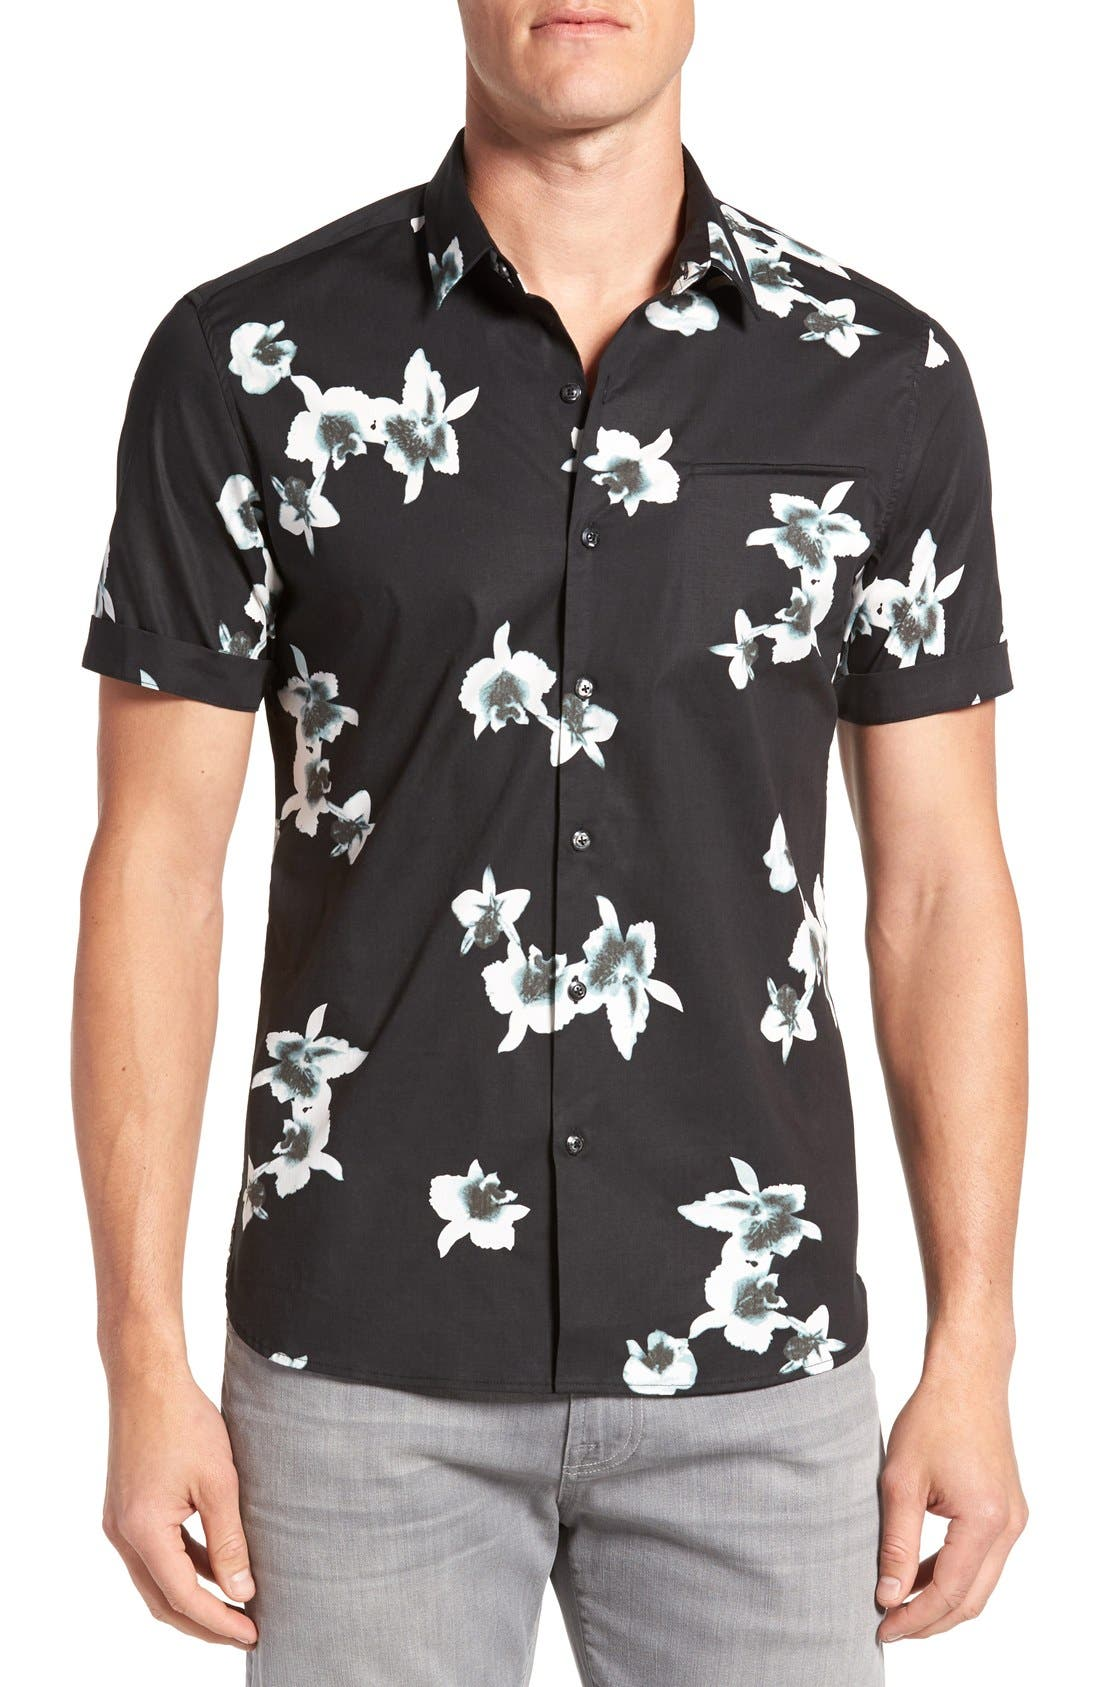 7 Diamonds 'My Wish' Short Sleeve Floral Print Sport Shirt